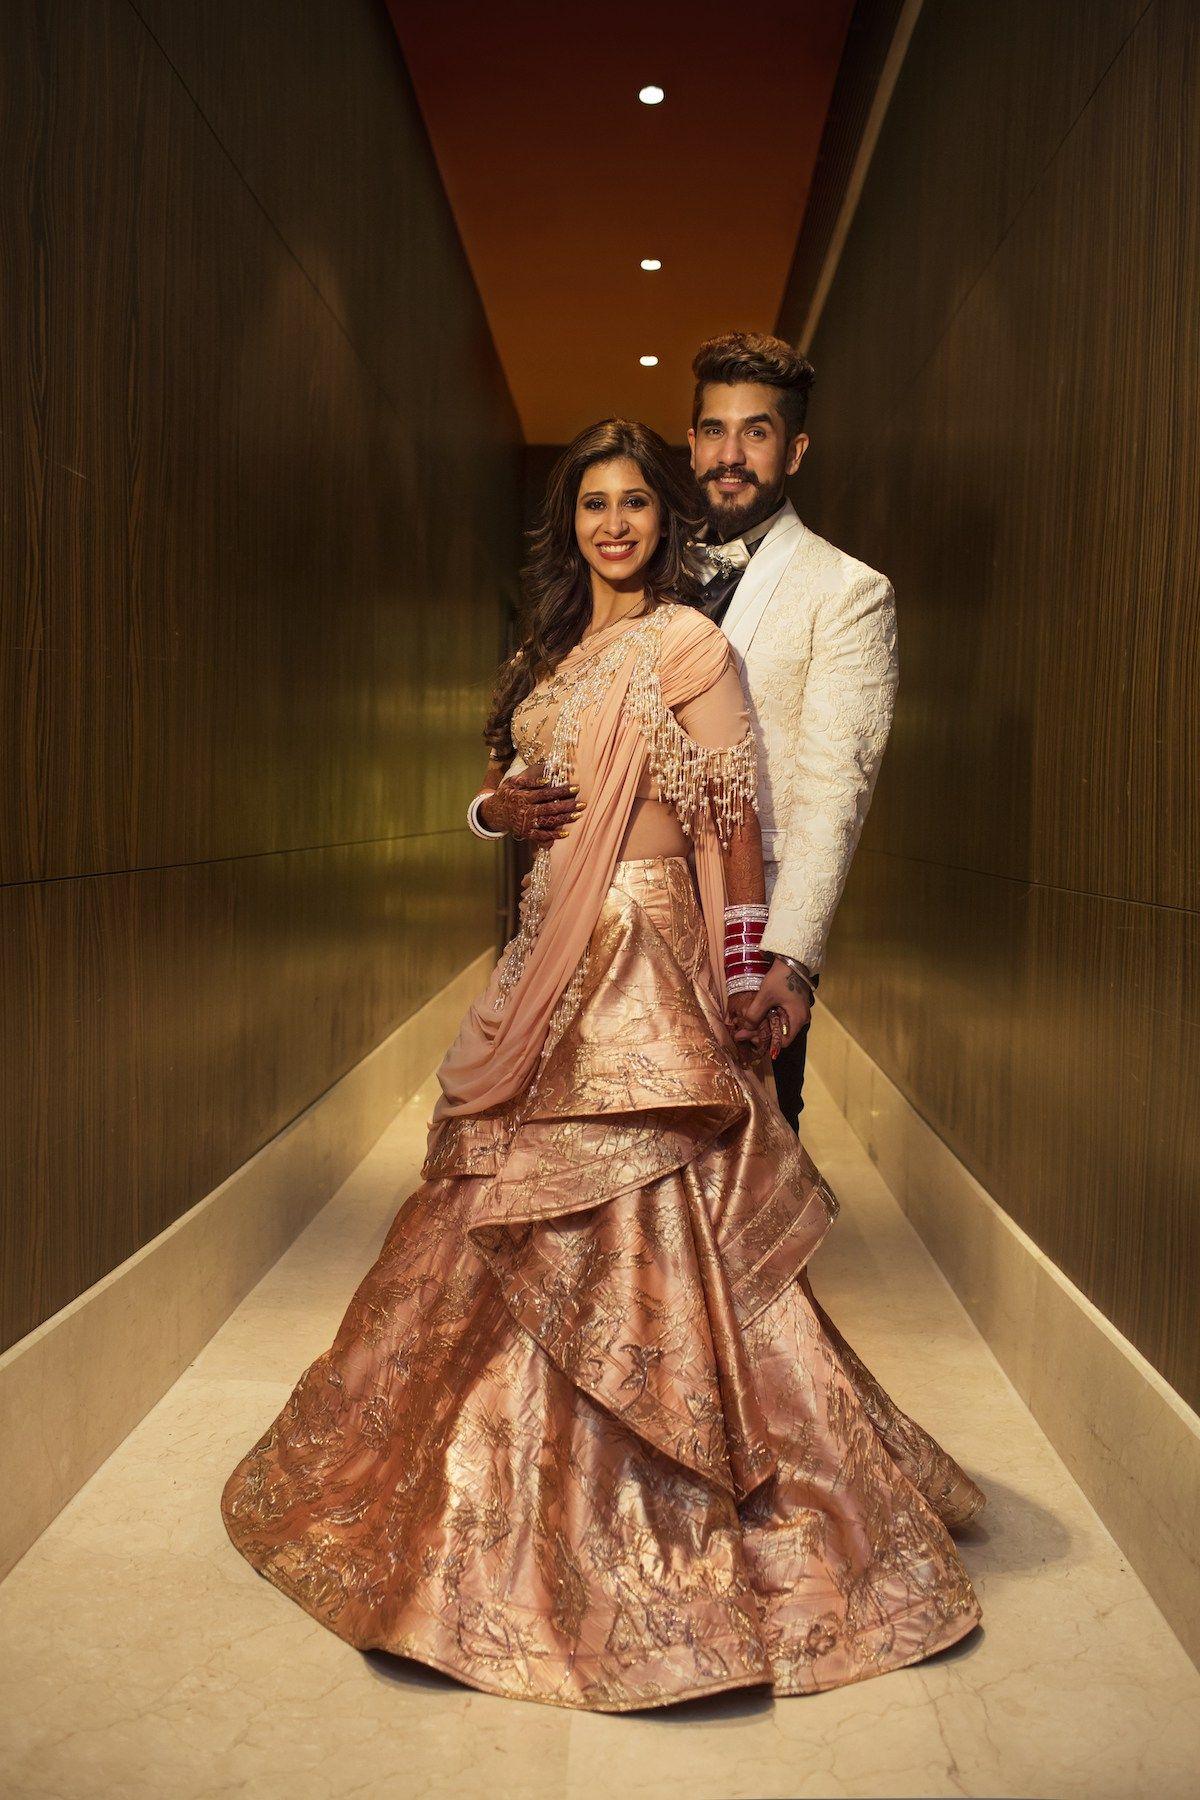 Pink Bridal Lehenga Kishwer + Suyyash South Asian